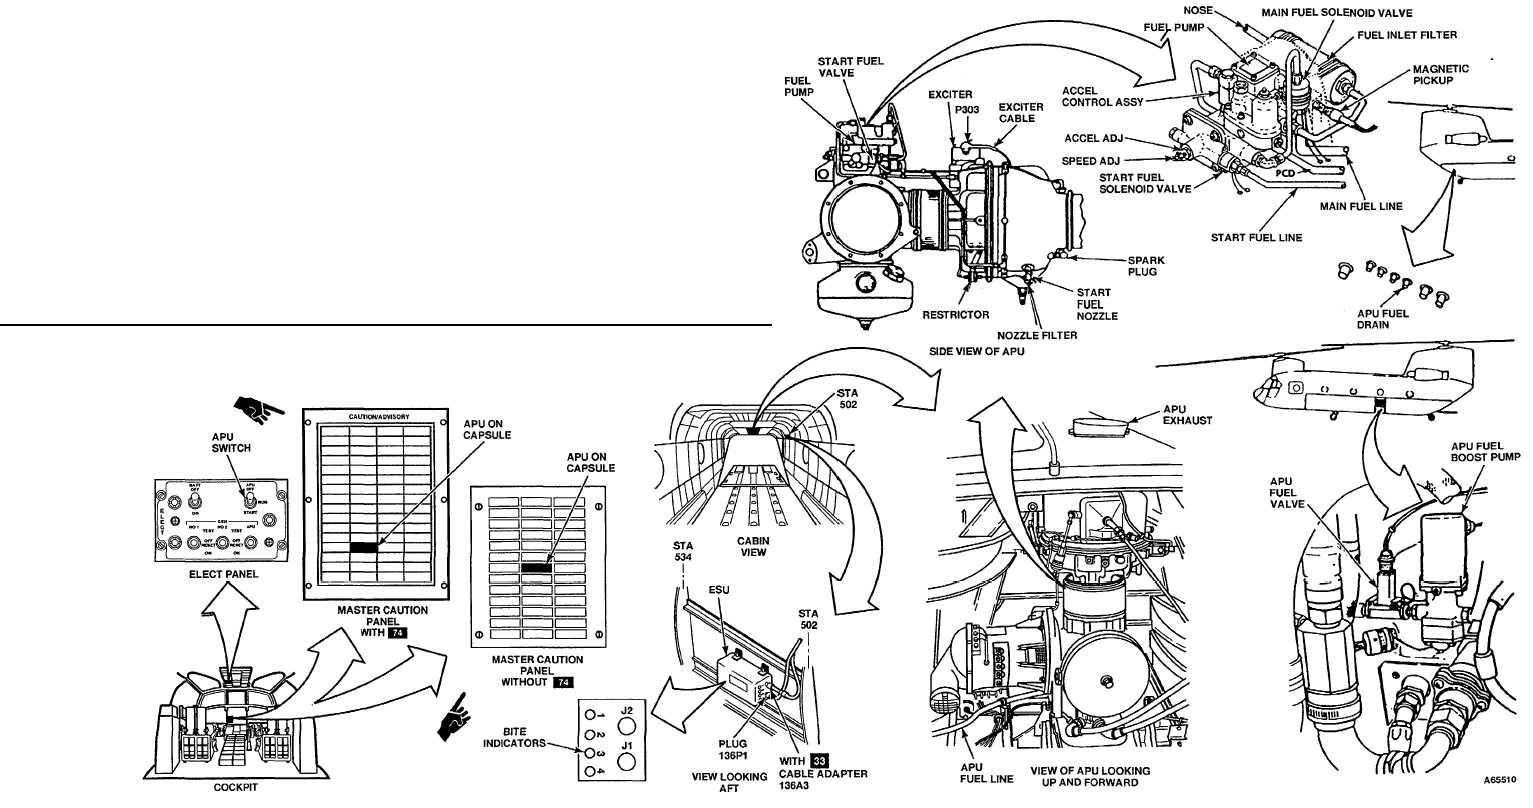 wiring diagram fuel system